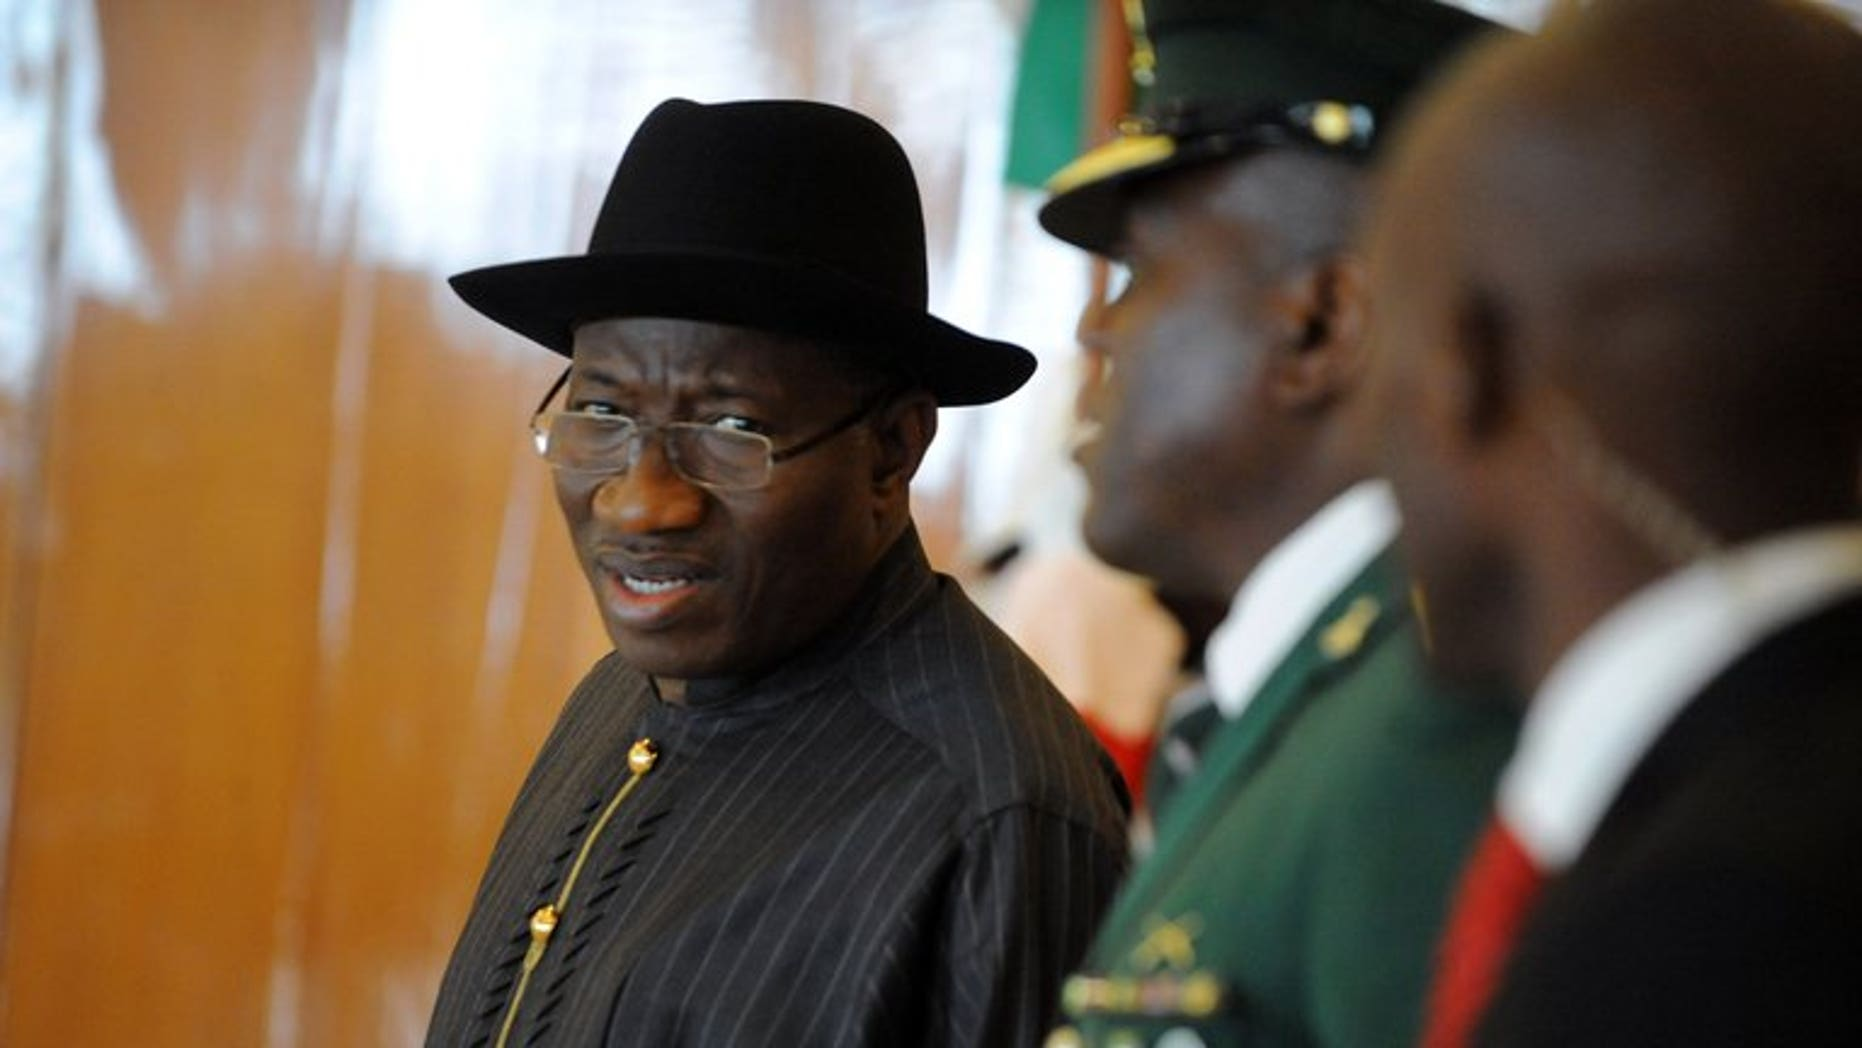 Nigerian President Goodluck Jonathan (L) in Abuja on July 18, 2013.